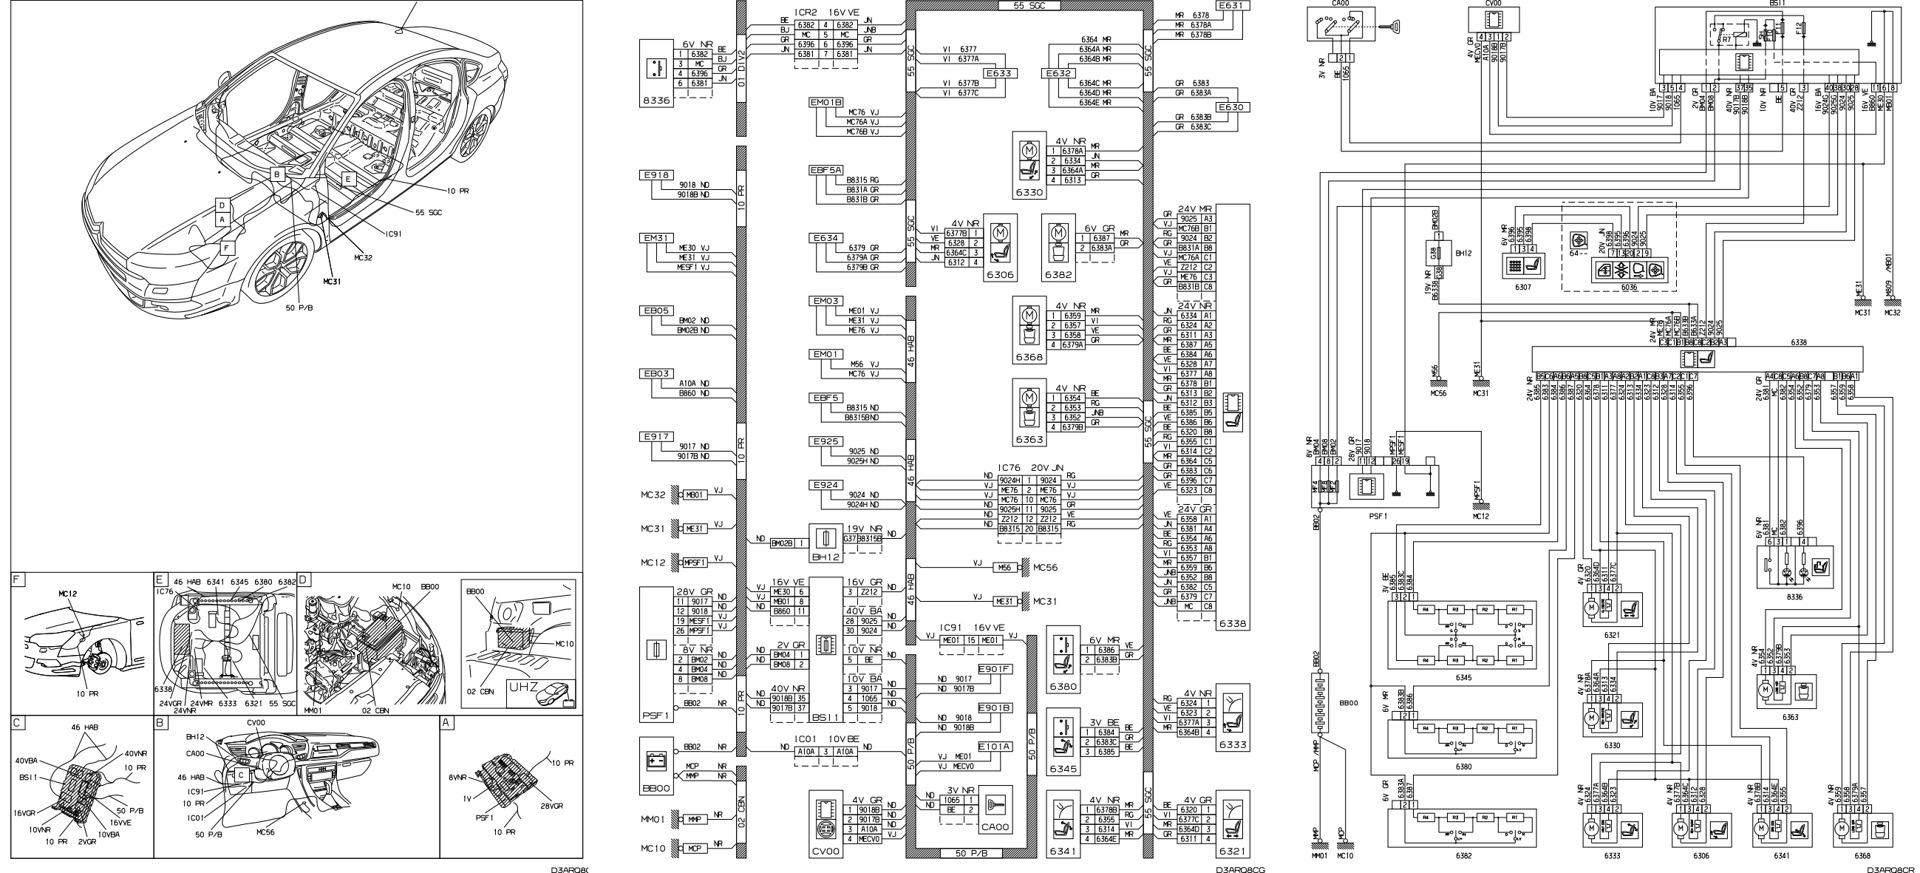 citroen c5 airbag wiring diagram mercedes color codes manual e books wrg 8679 diagramcitroen collection of